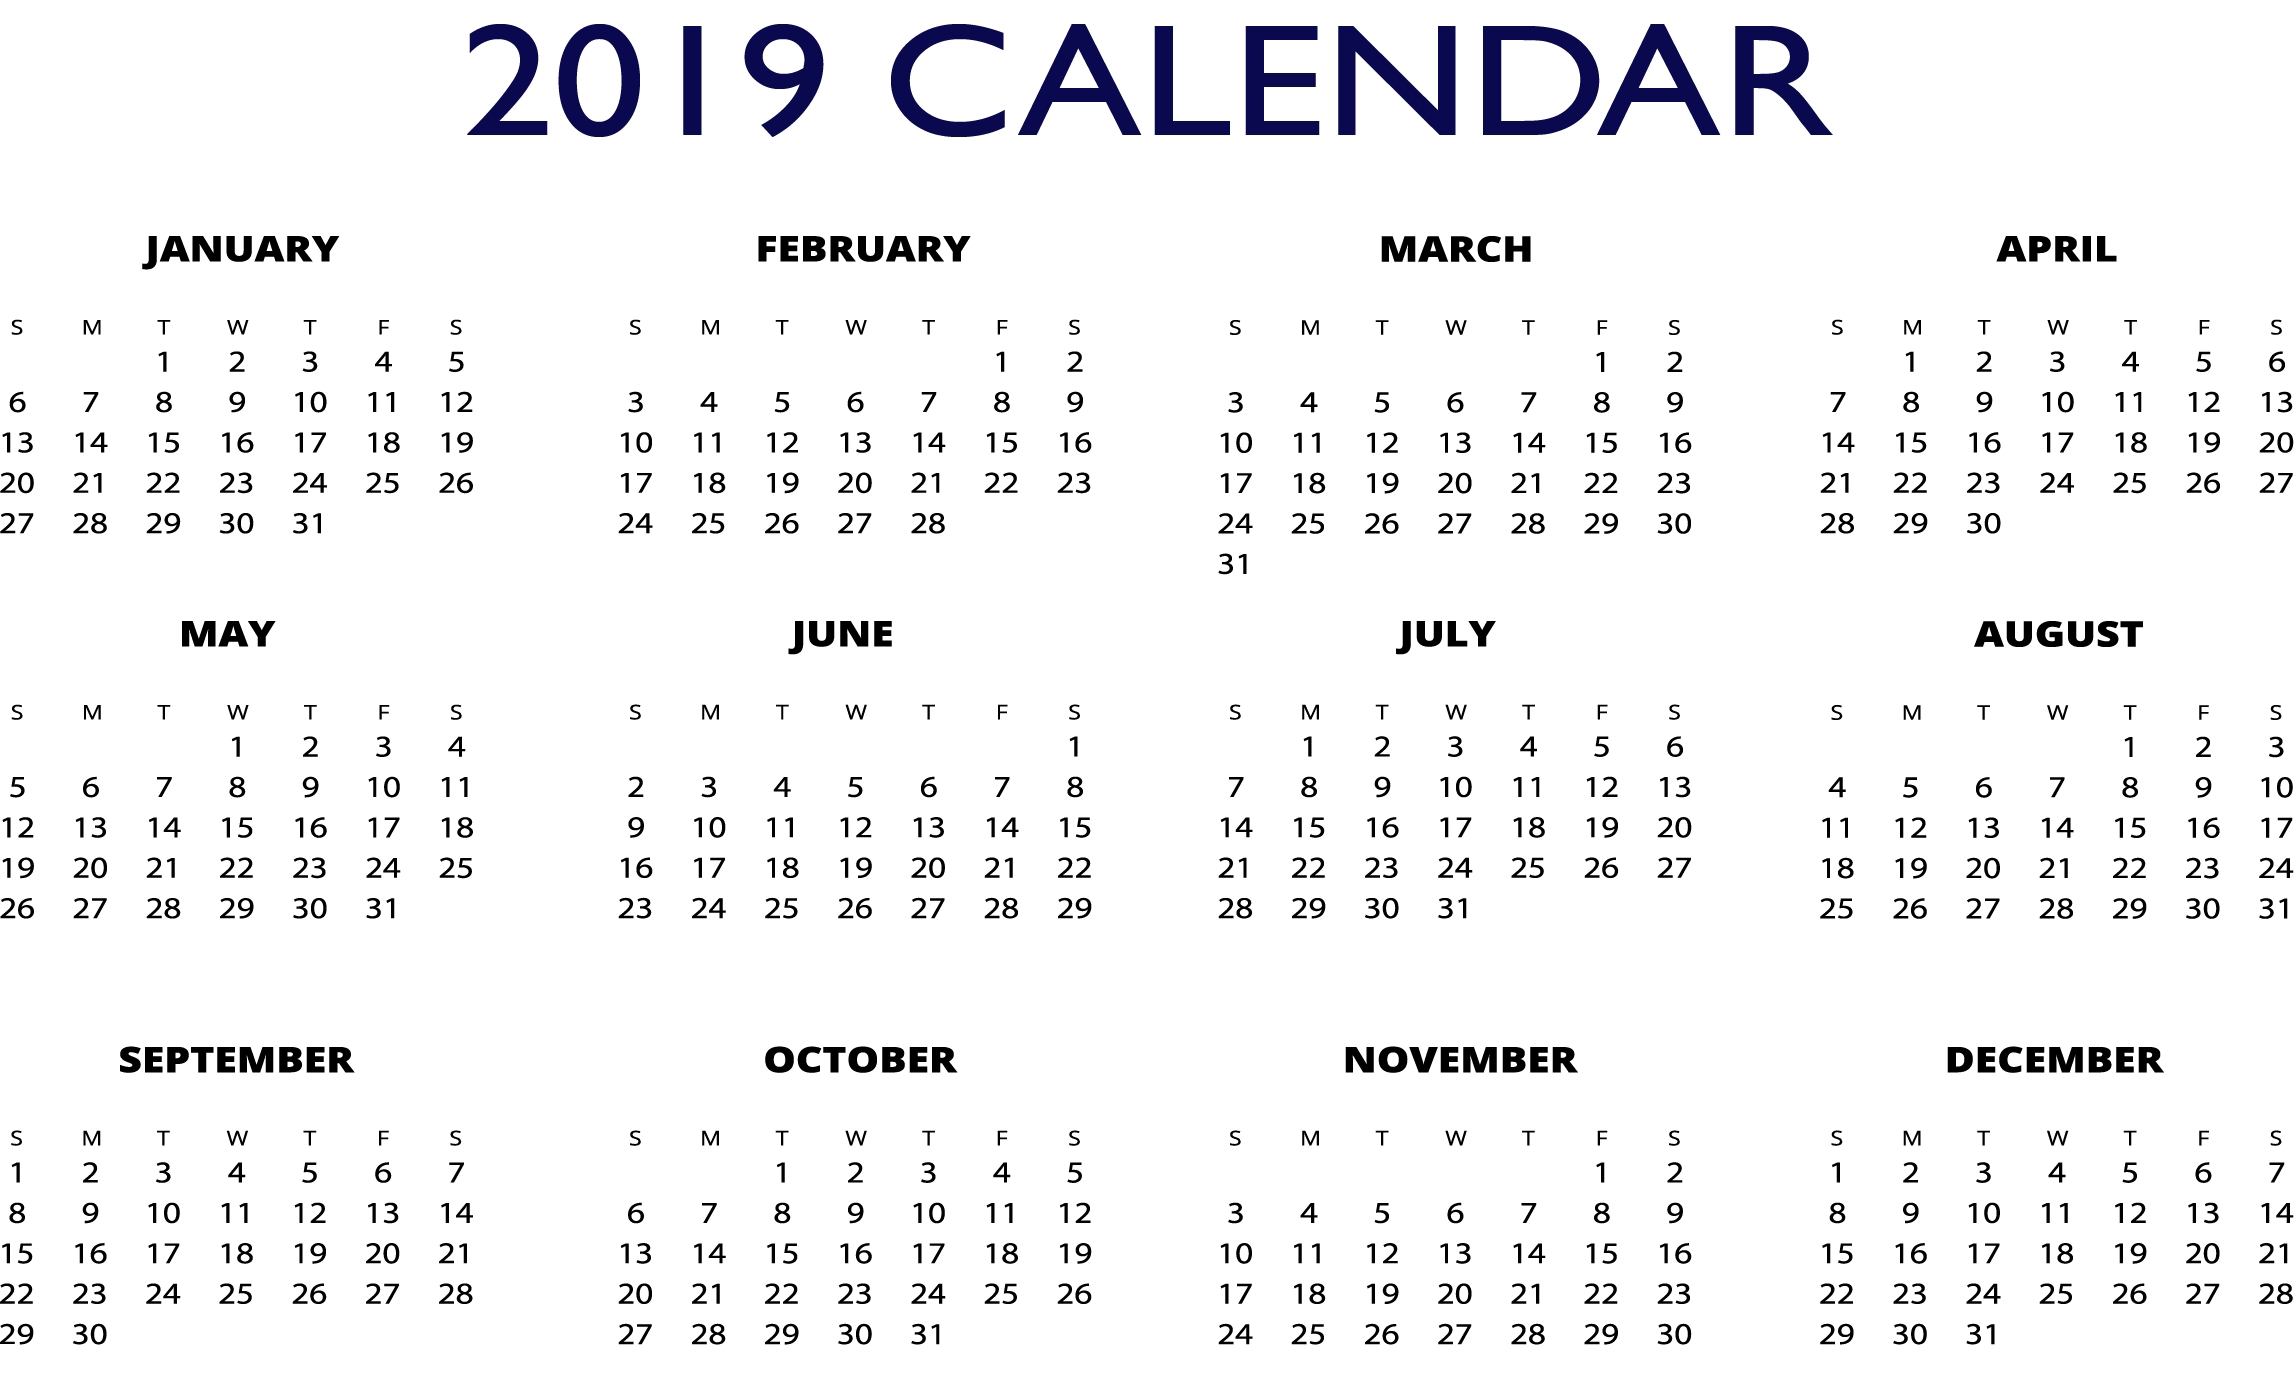 2019 Excel One Page Calendar | 2019 Calendars | Pinterest | Calendar Calendar 2019 For Excel